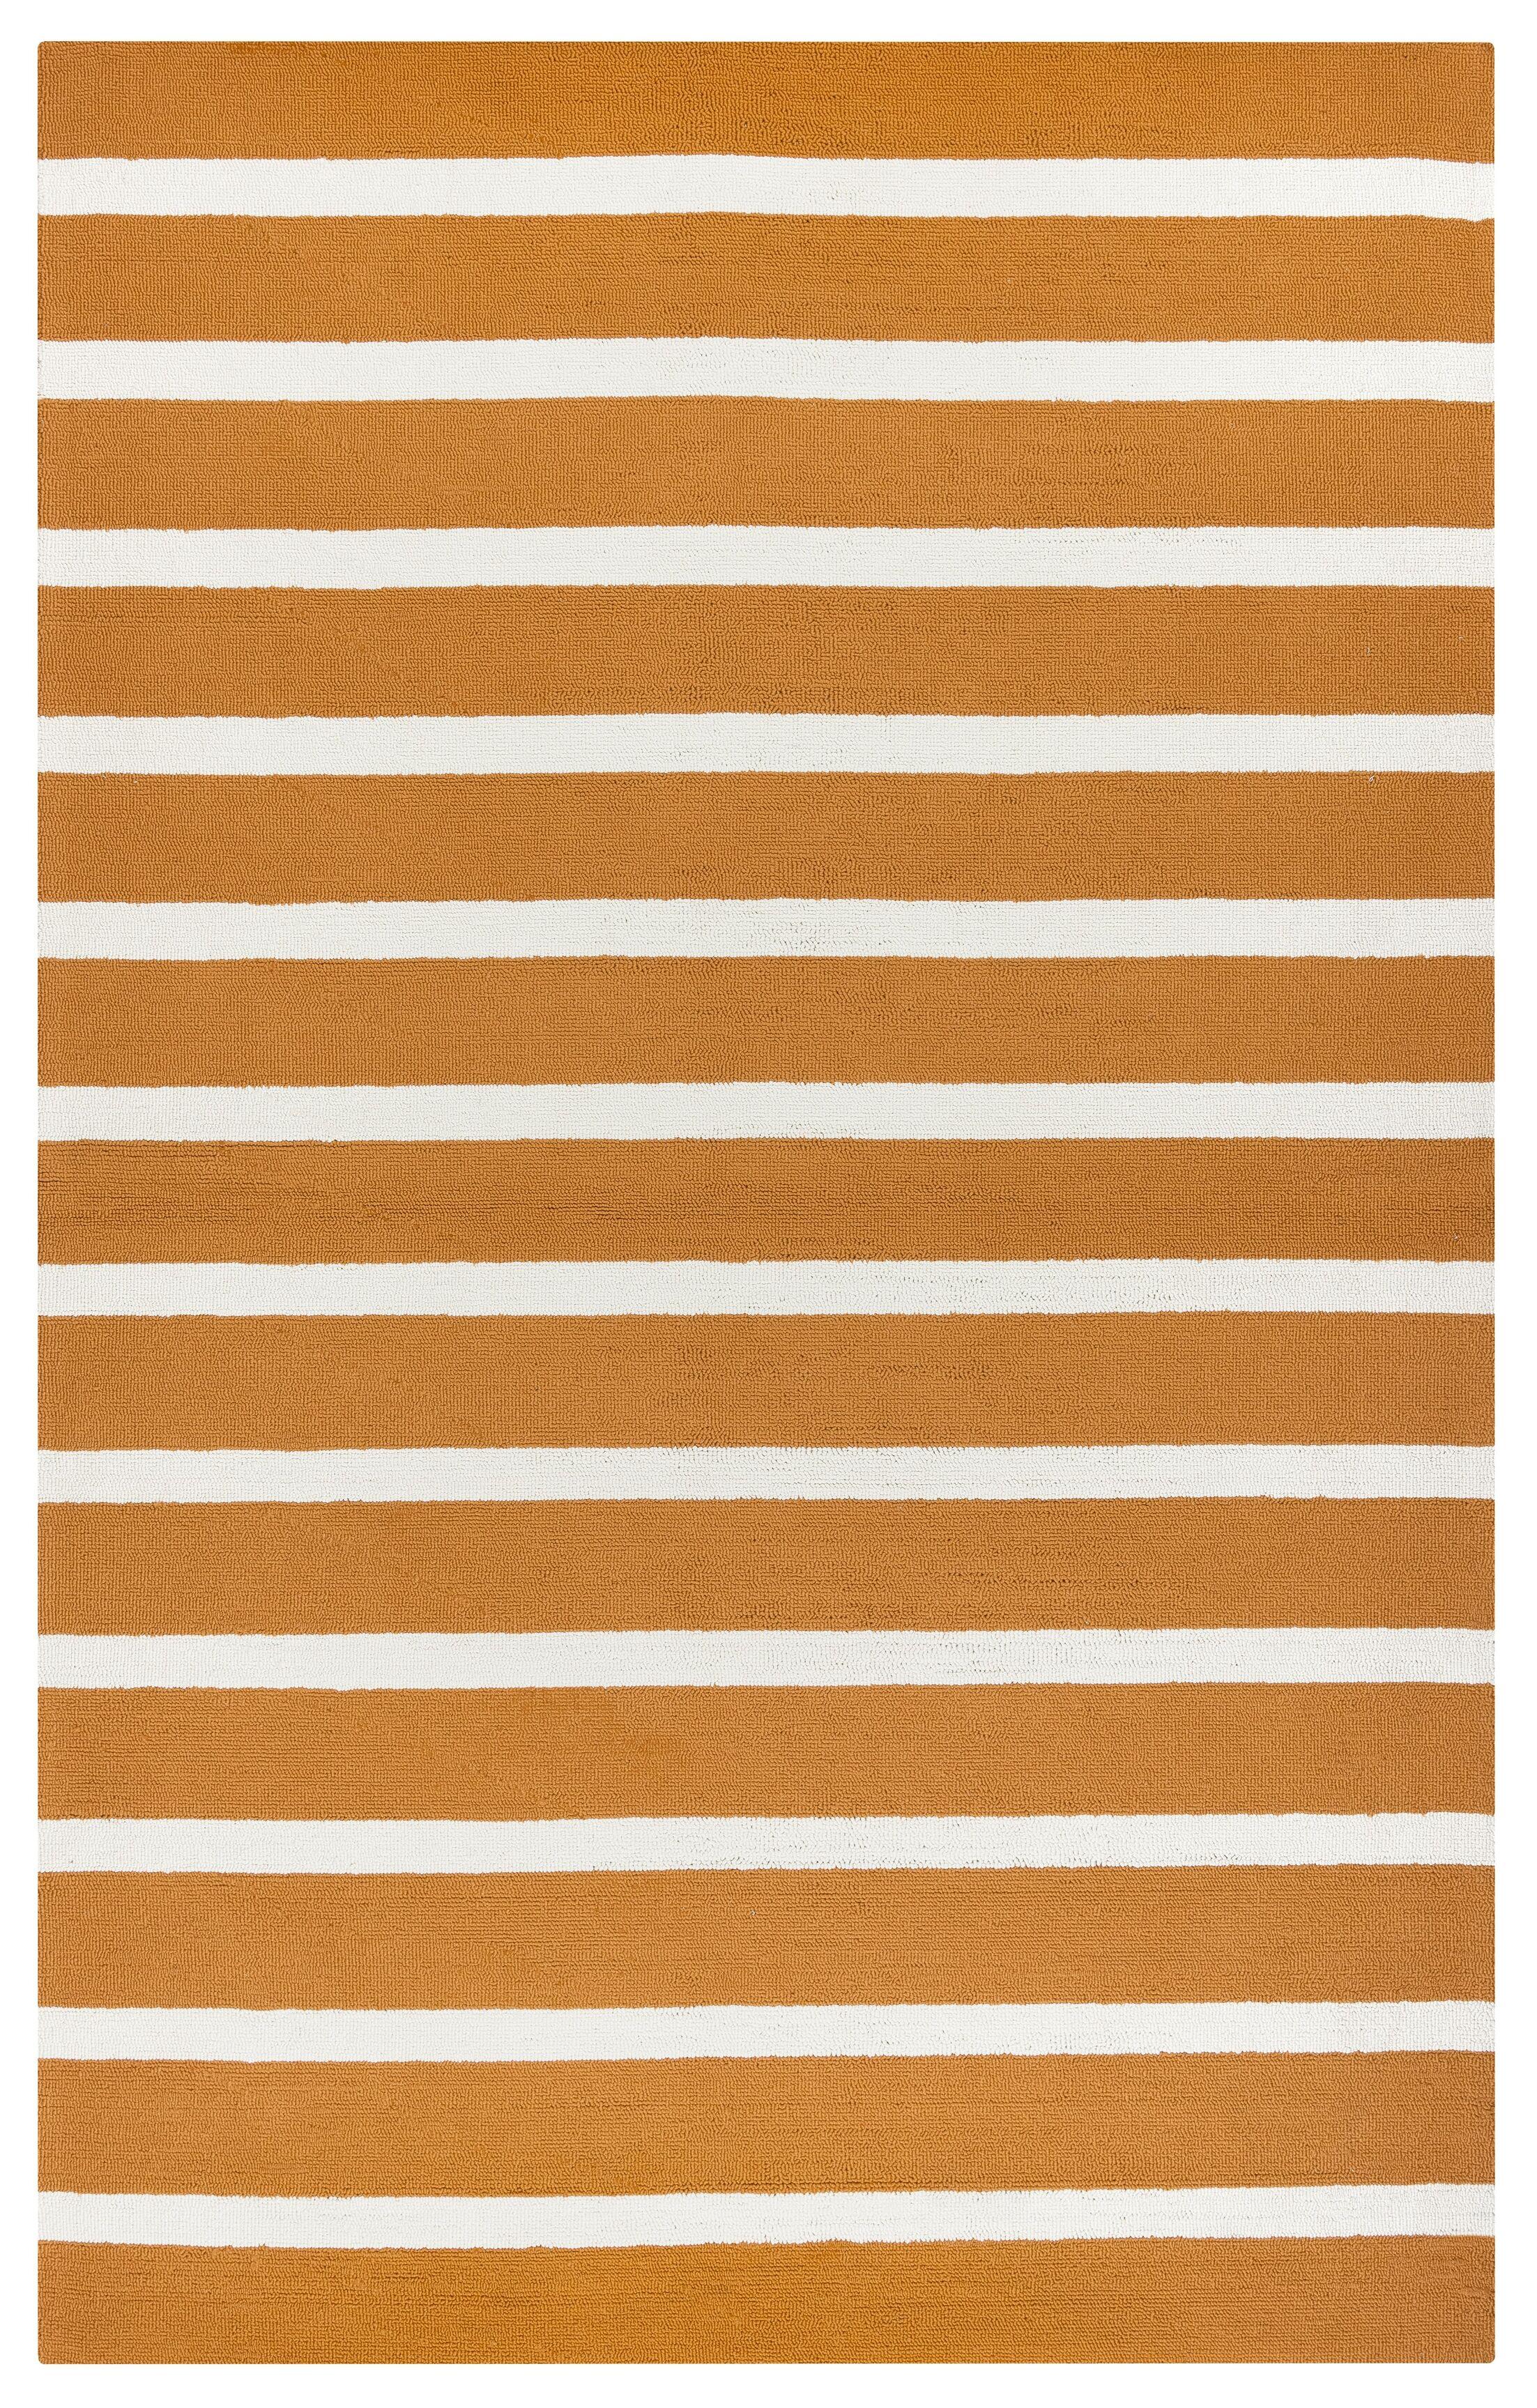 Lyndon Hand-Tufted Orange Indoor/Outdoor Area Rug Size: Rectangle 7'6